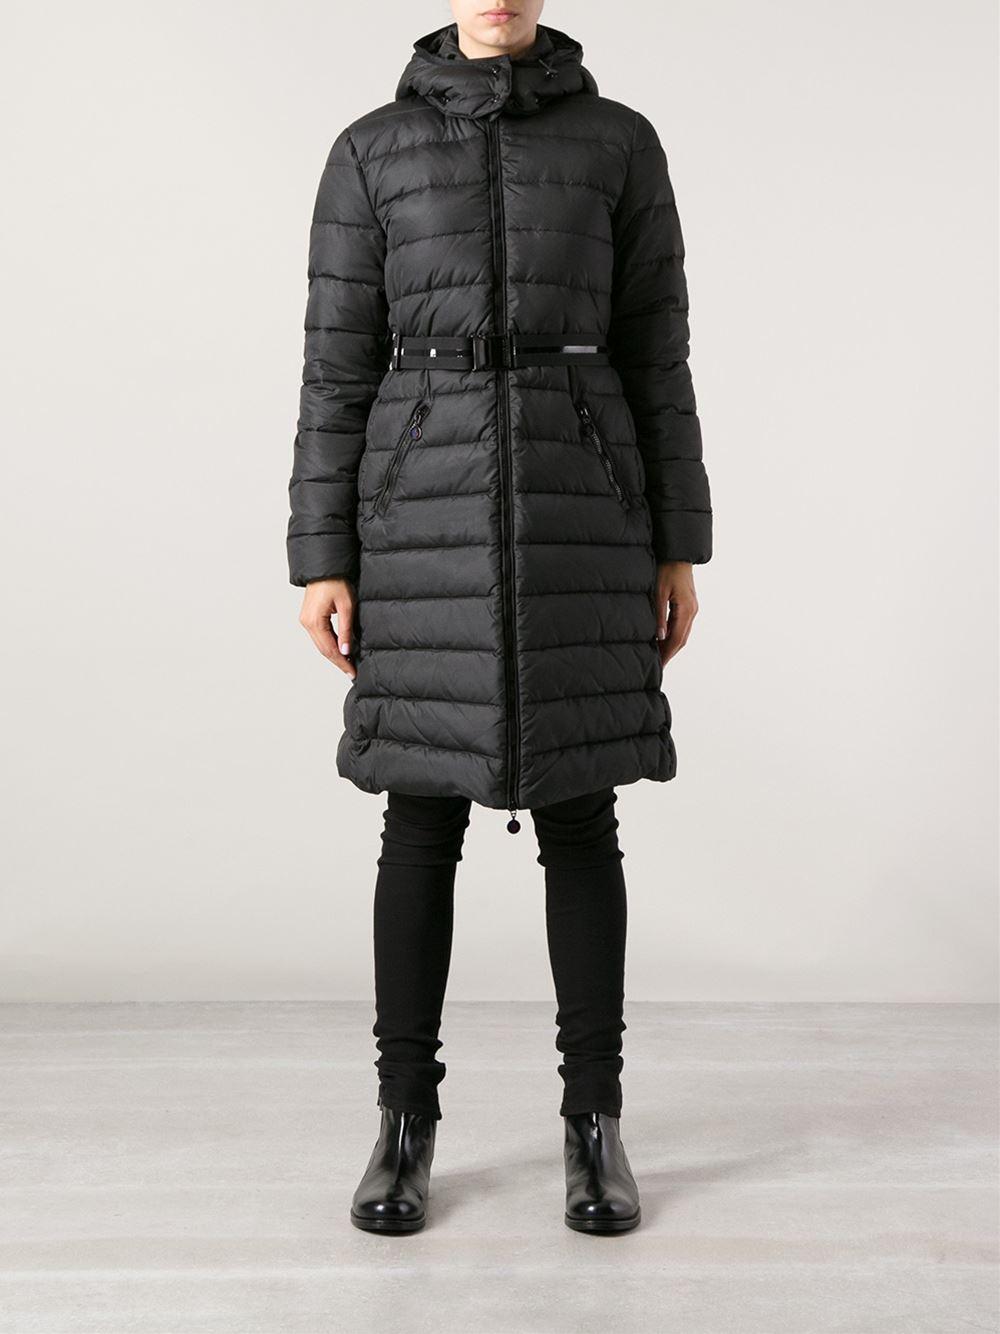 Moncler Black Mokacine Coat